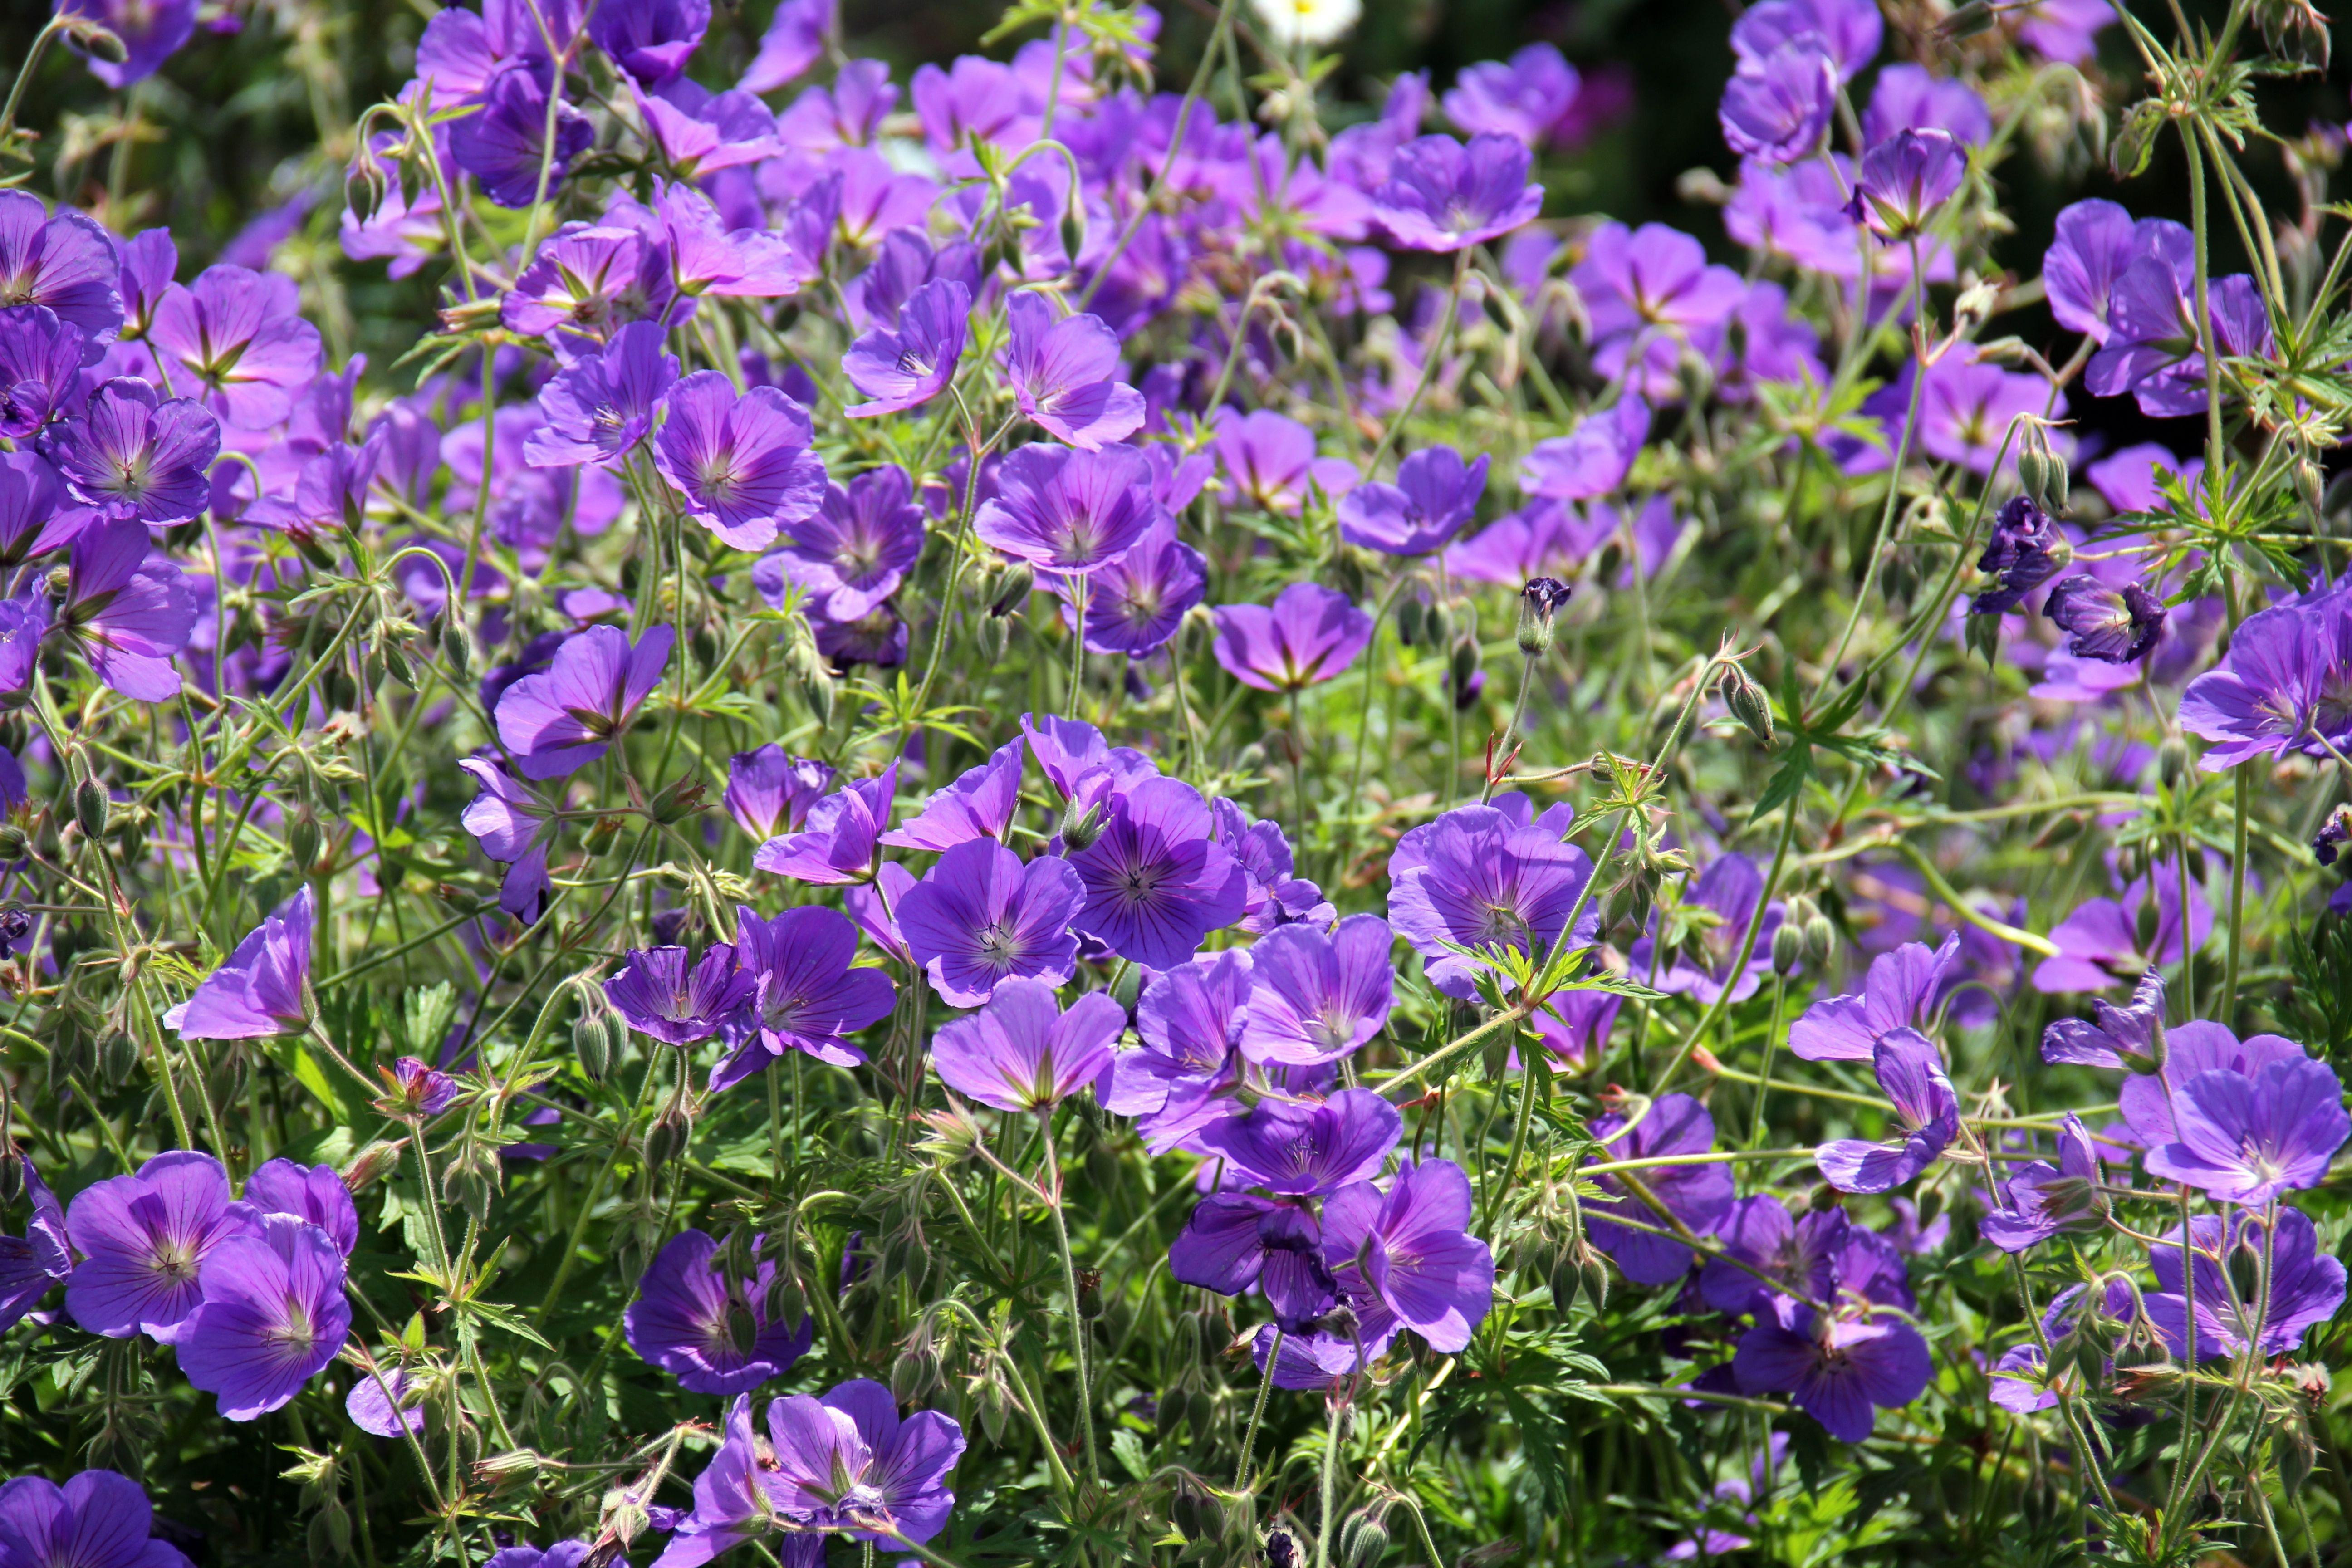 Gratis billeder : natur, blomst, lilla, wildflower, blomster, geranium, viola, storkenæb ...